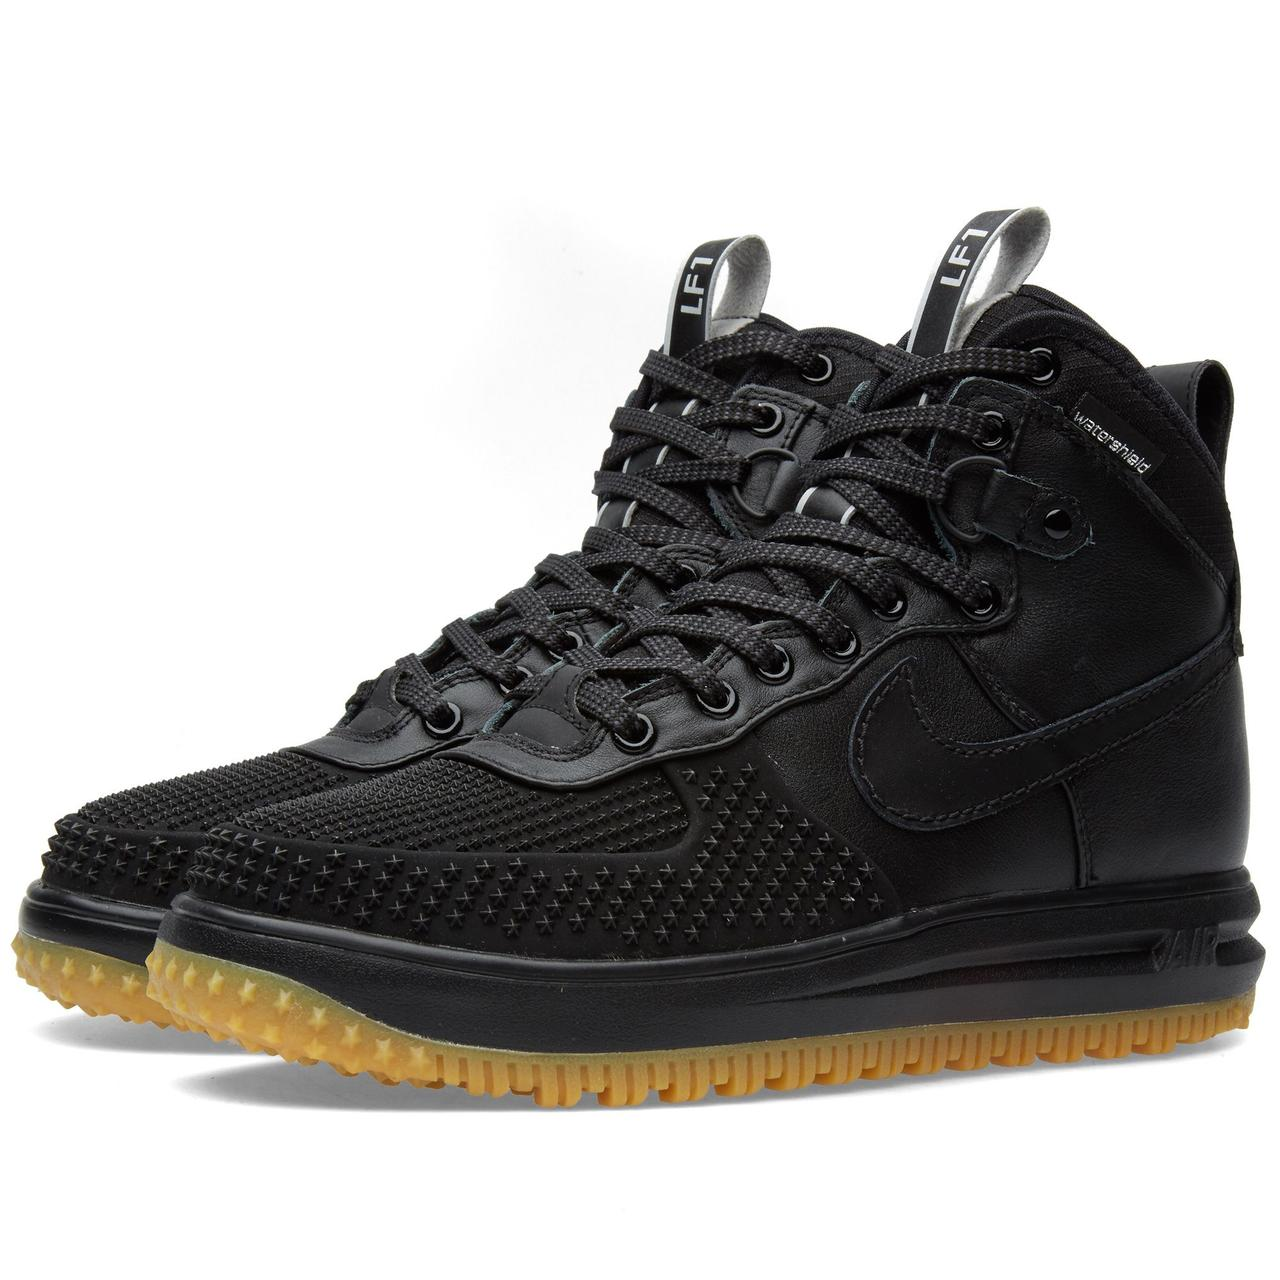 d31b846f Оригинальные кроссовки Nike Lunar Force 1 Duckboot Black - Sport-Sneakers -  Оригинальные кроссовки -